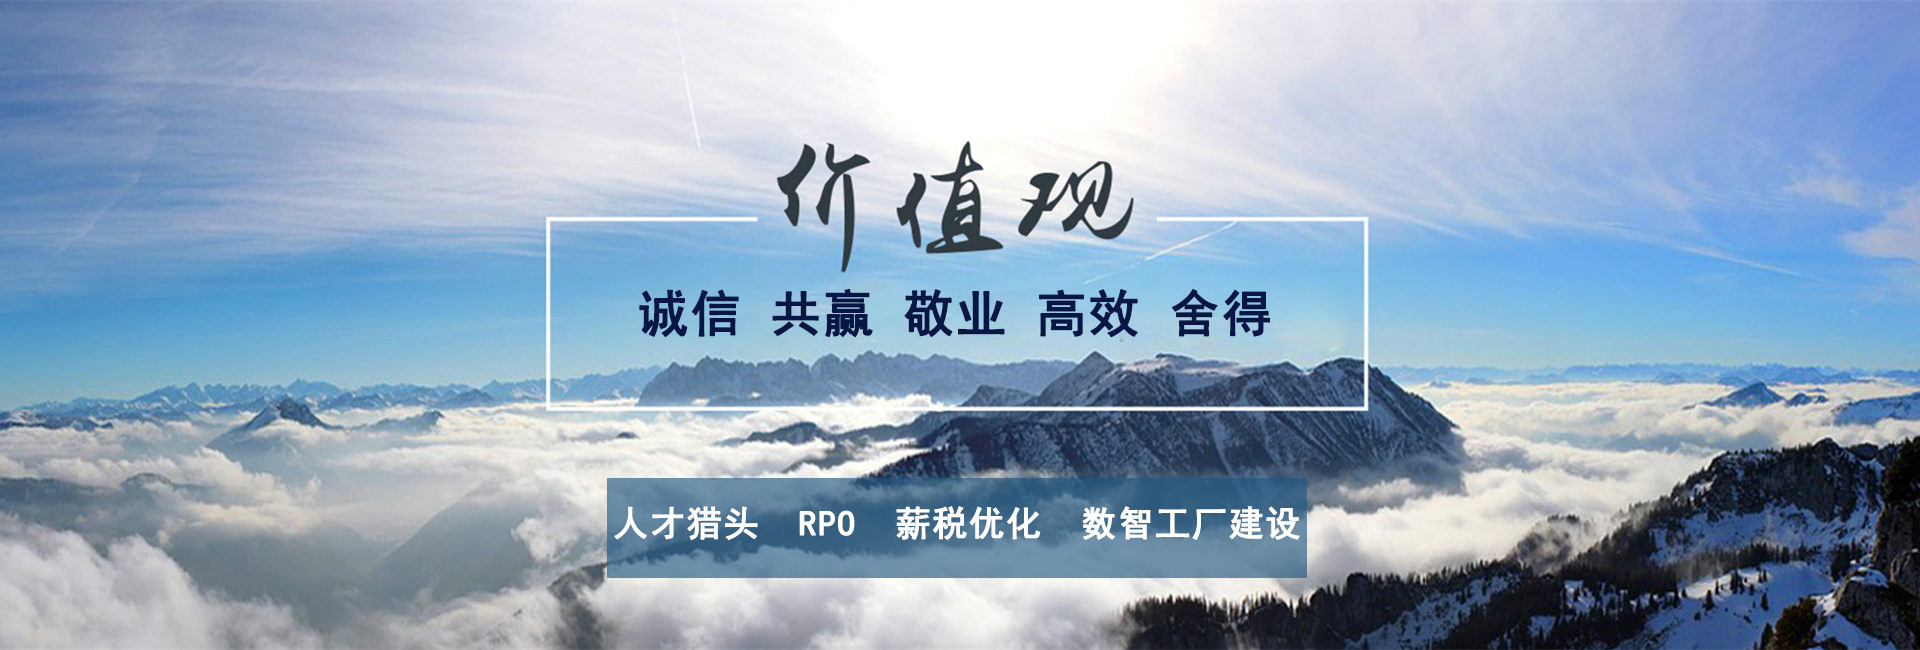 http://www.genchina.net/uploads/200613/1-2006131105324P.jpg